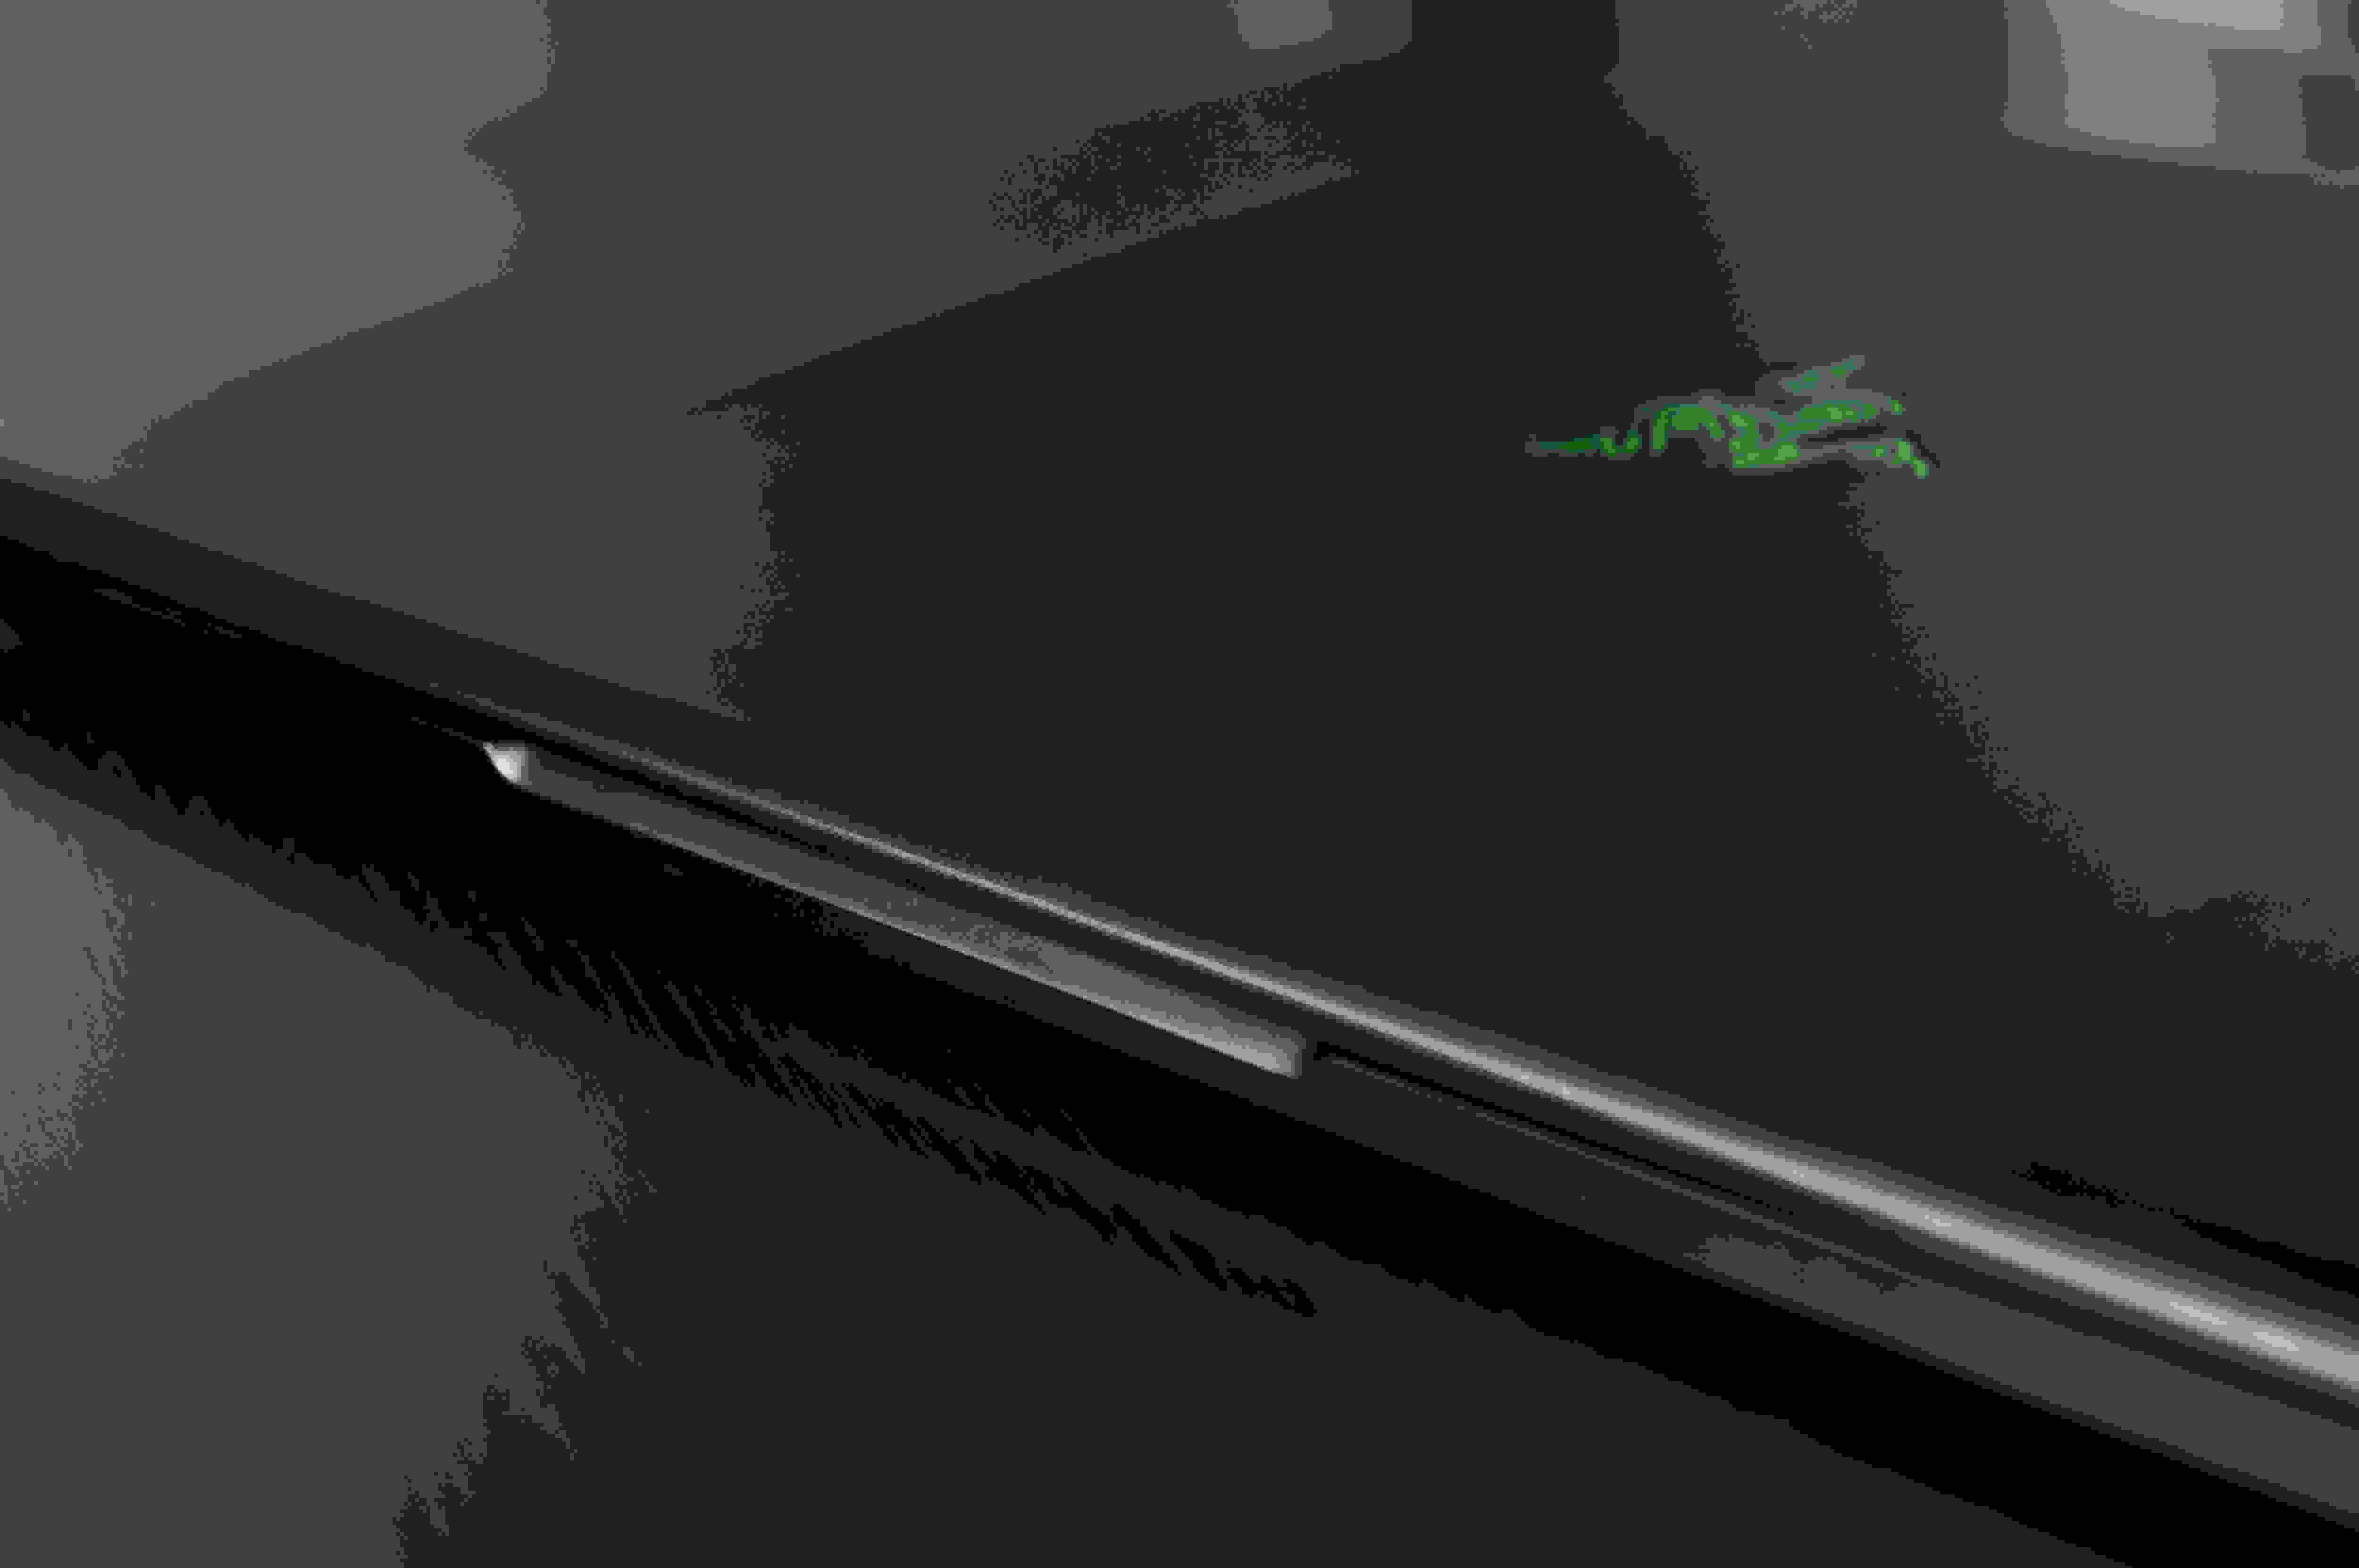 A photo of the Razer Blade Pro closed.